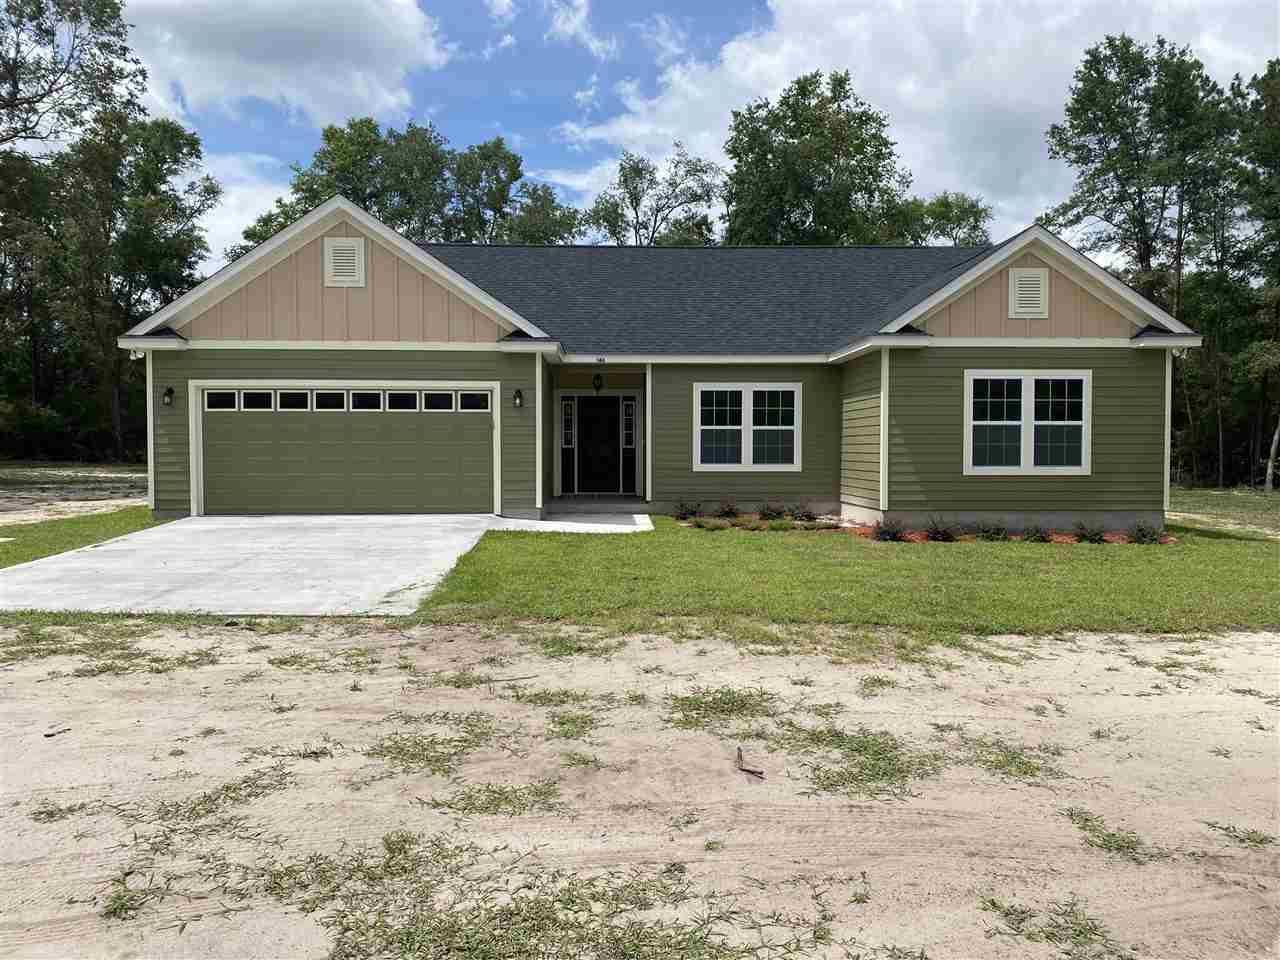 146 Mayfair Drive, Crawfordville, FL 32327 - MLS#: 334557